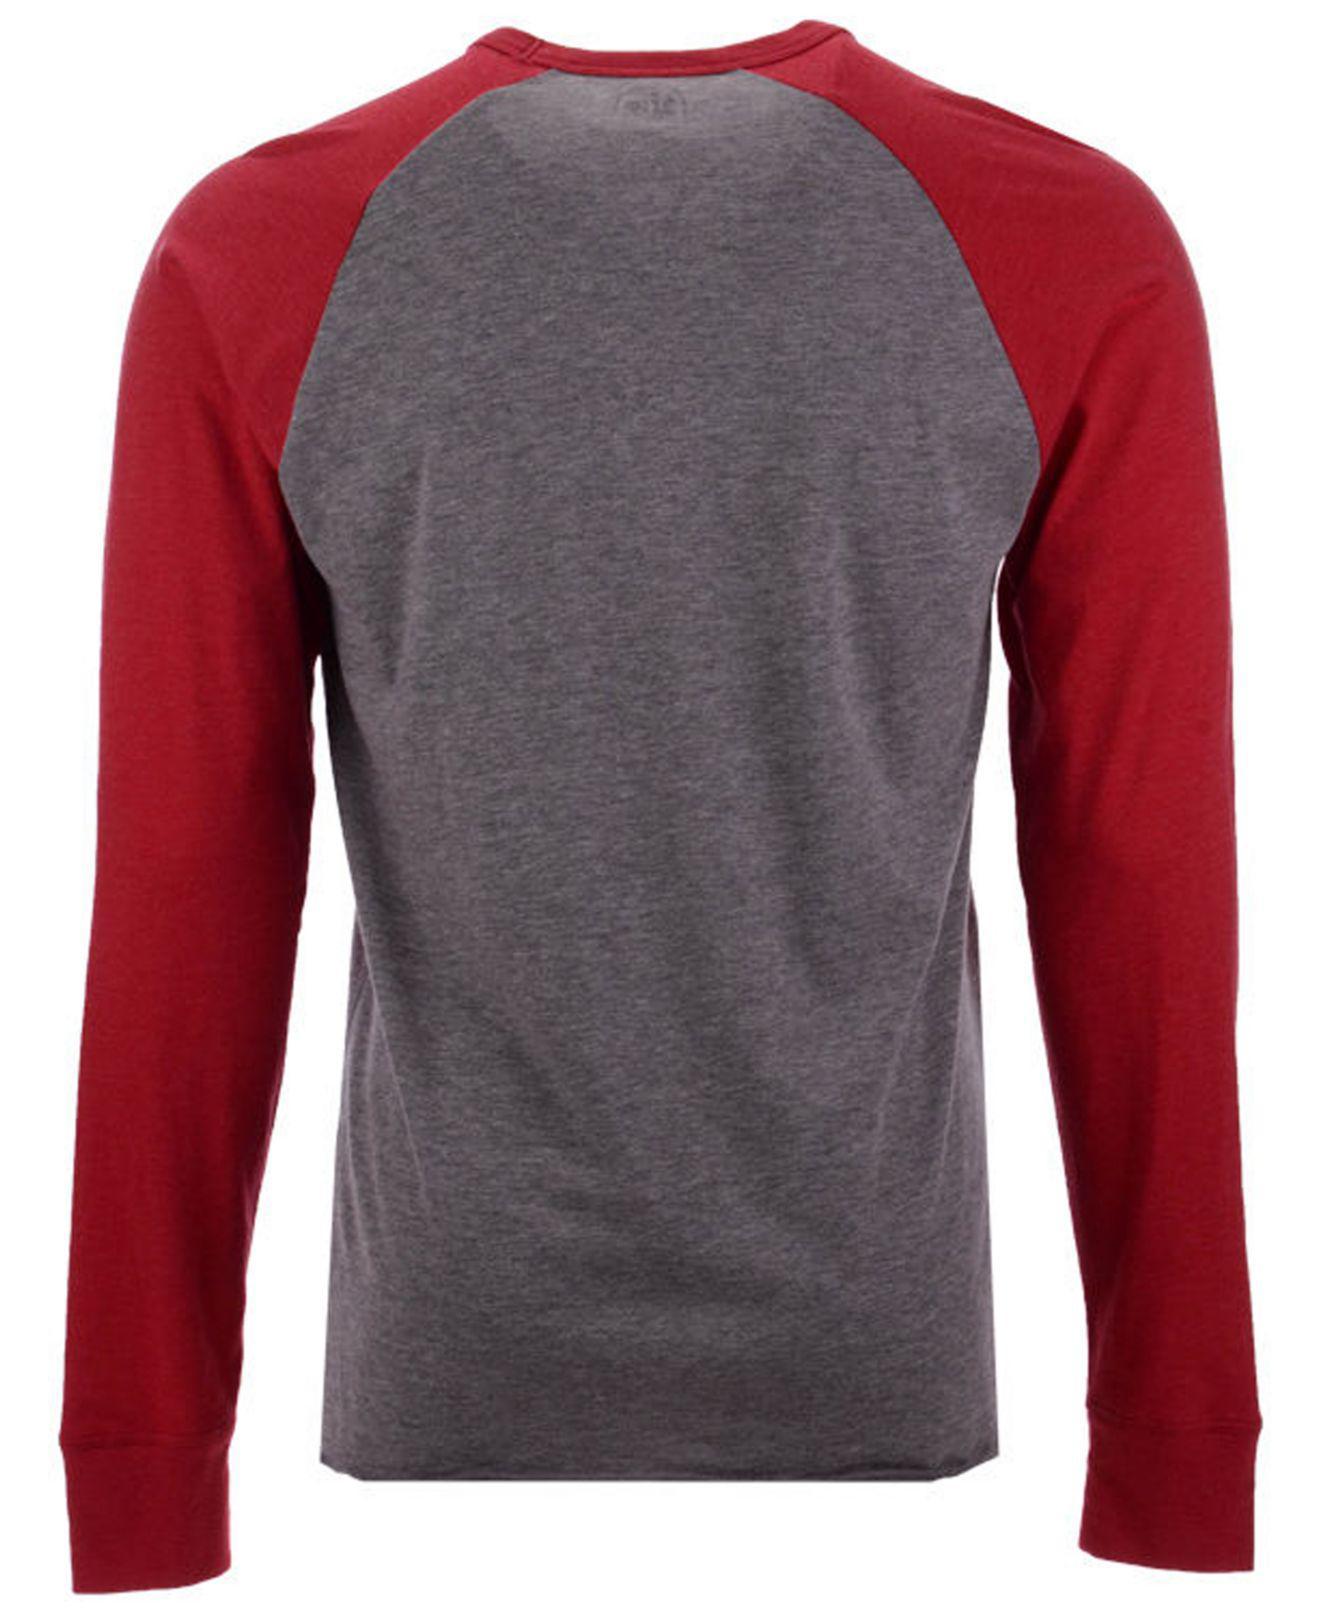 Lyst - 47 Brand Tampa Bay Buccaneers Retro Encircled Long Sleeve Club  Raglan T-shirt in Gray for Men fb06ccc65